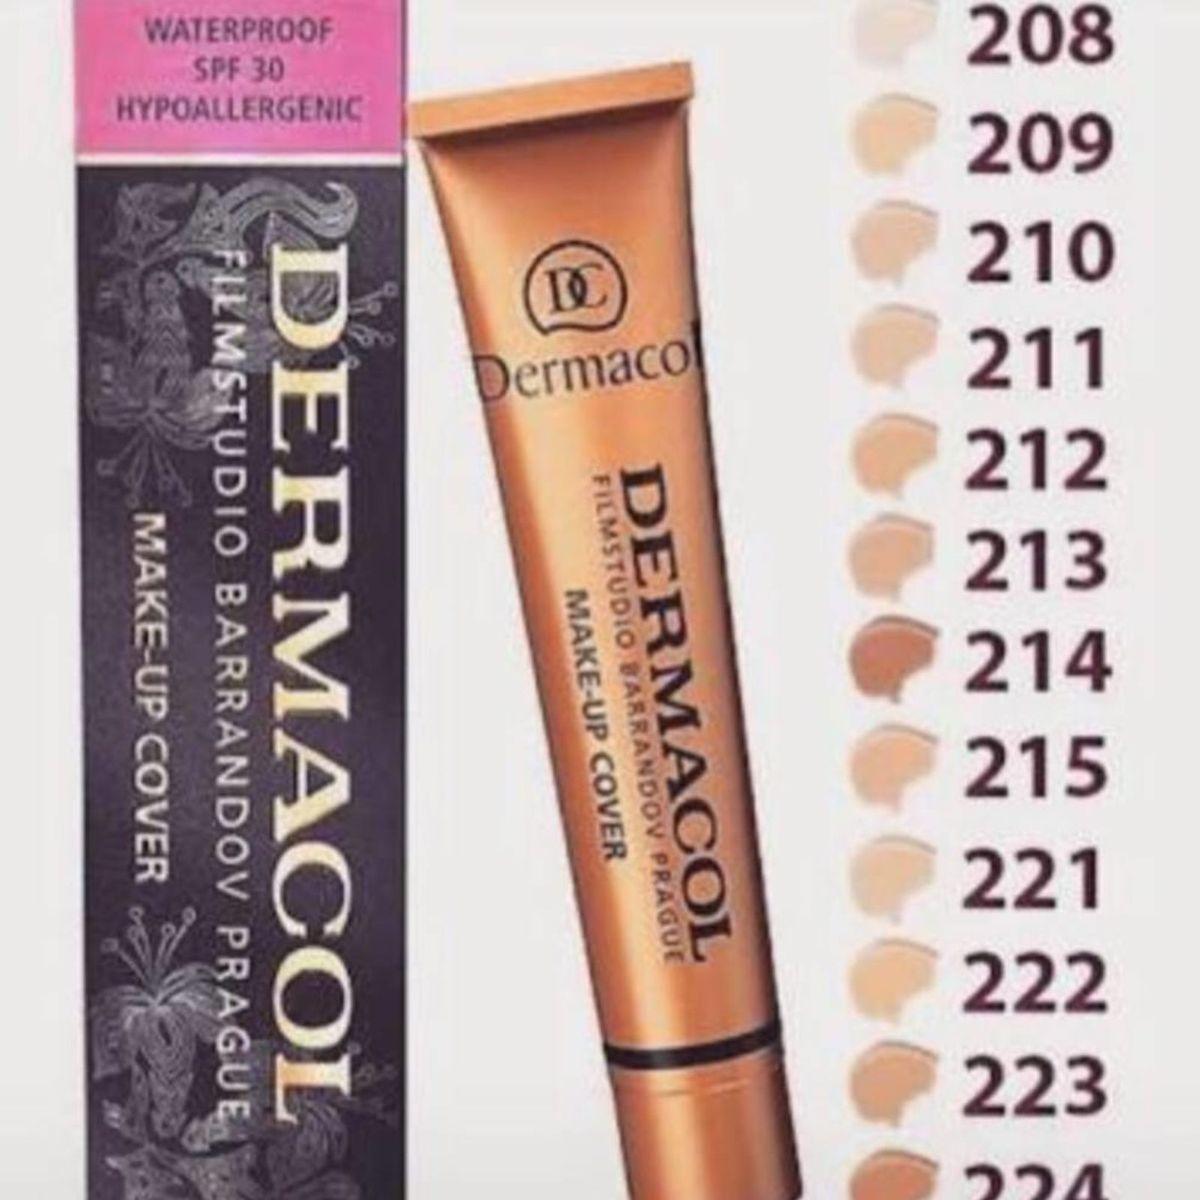 bb15cc490 Base Dermacol Pronta Entrega! | Maquiagem Feminina Dermacol Nunca Usado  15920974 | enjoei